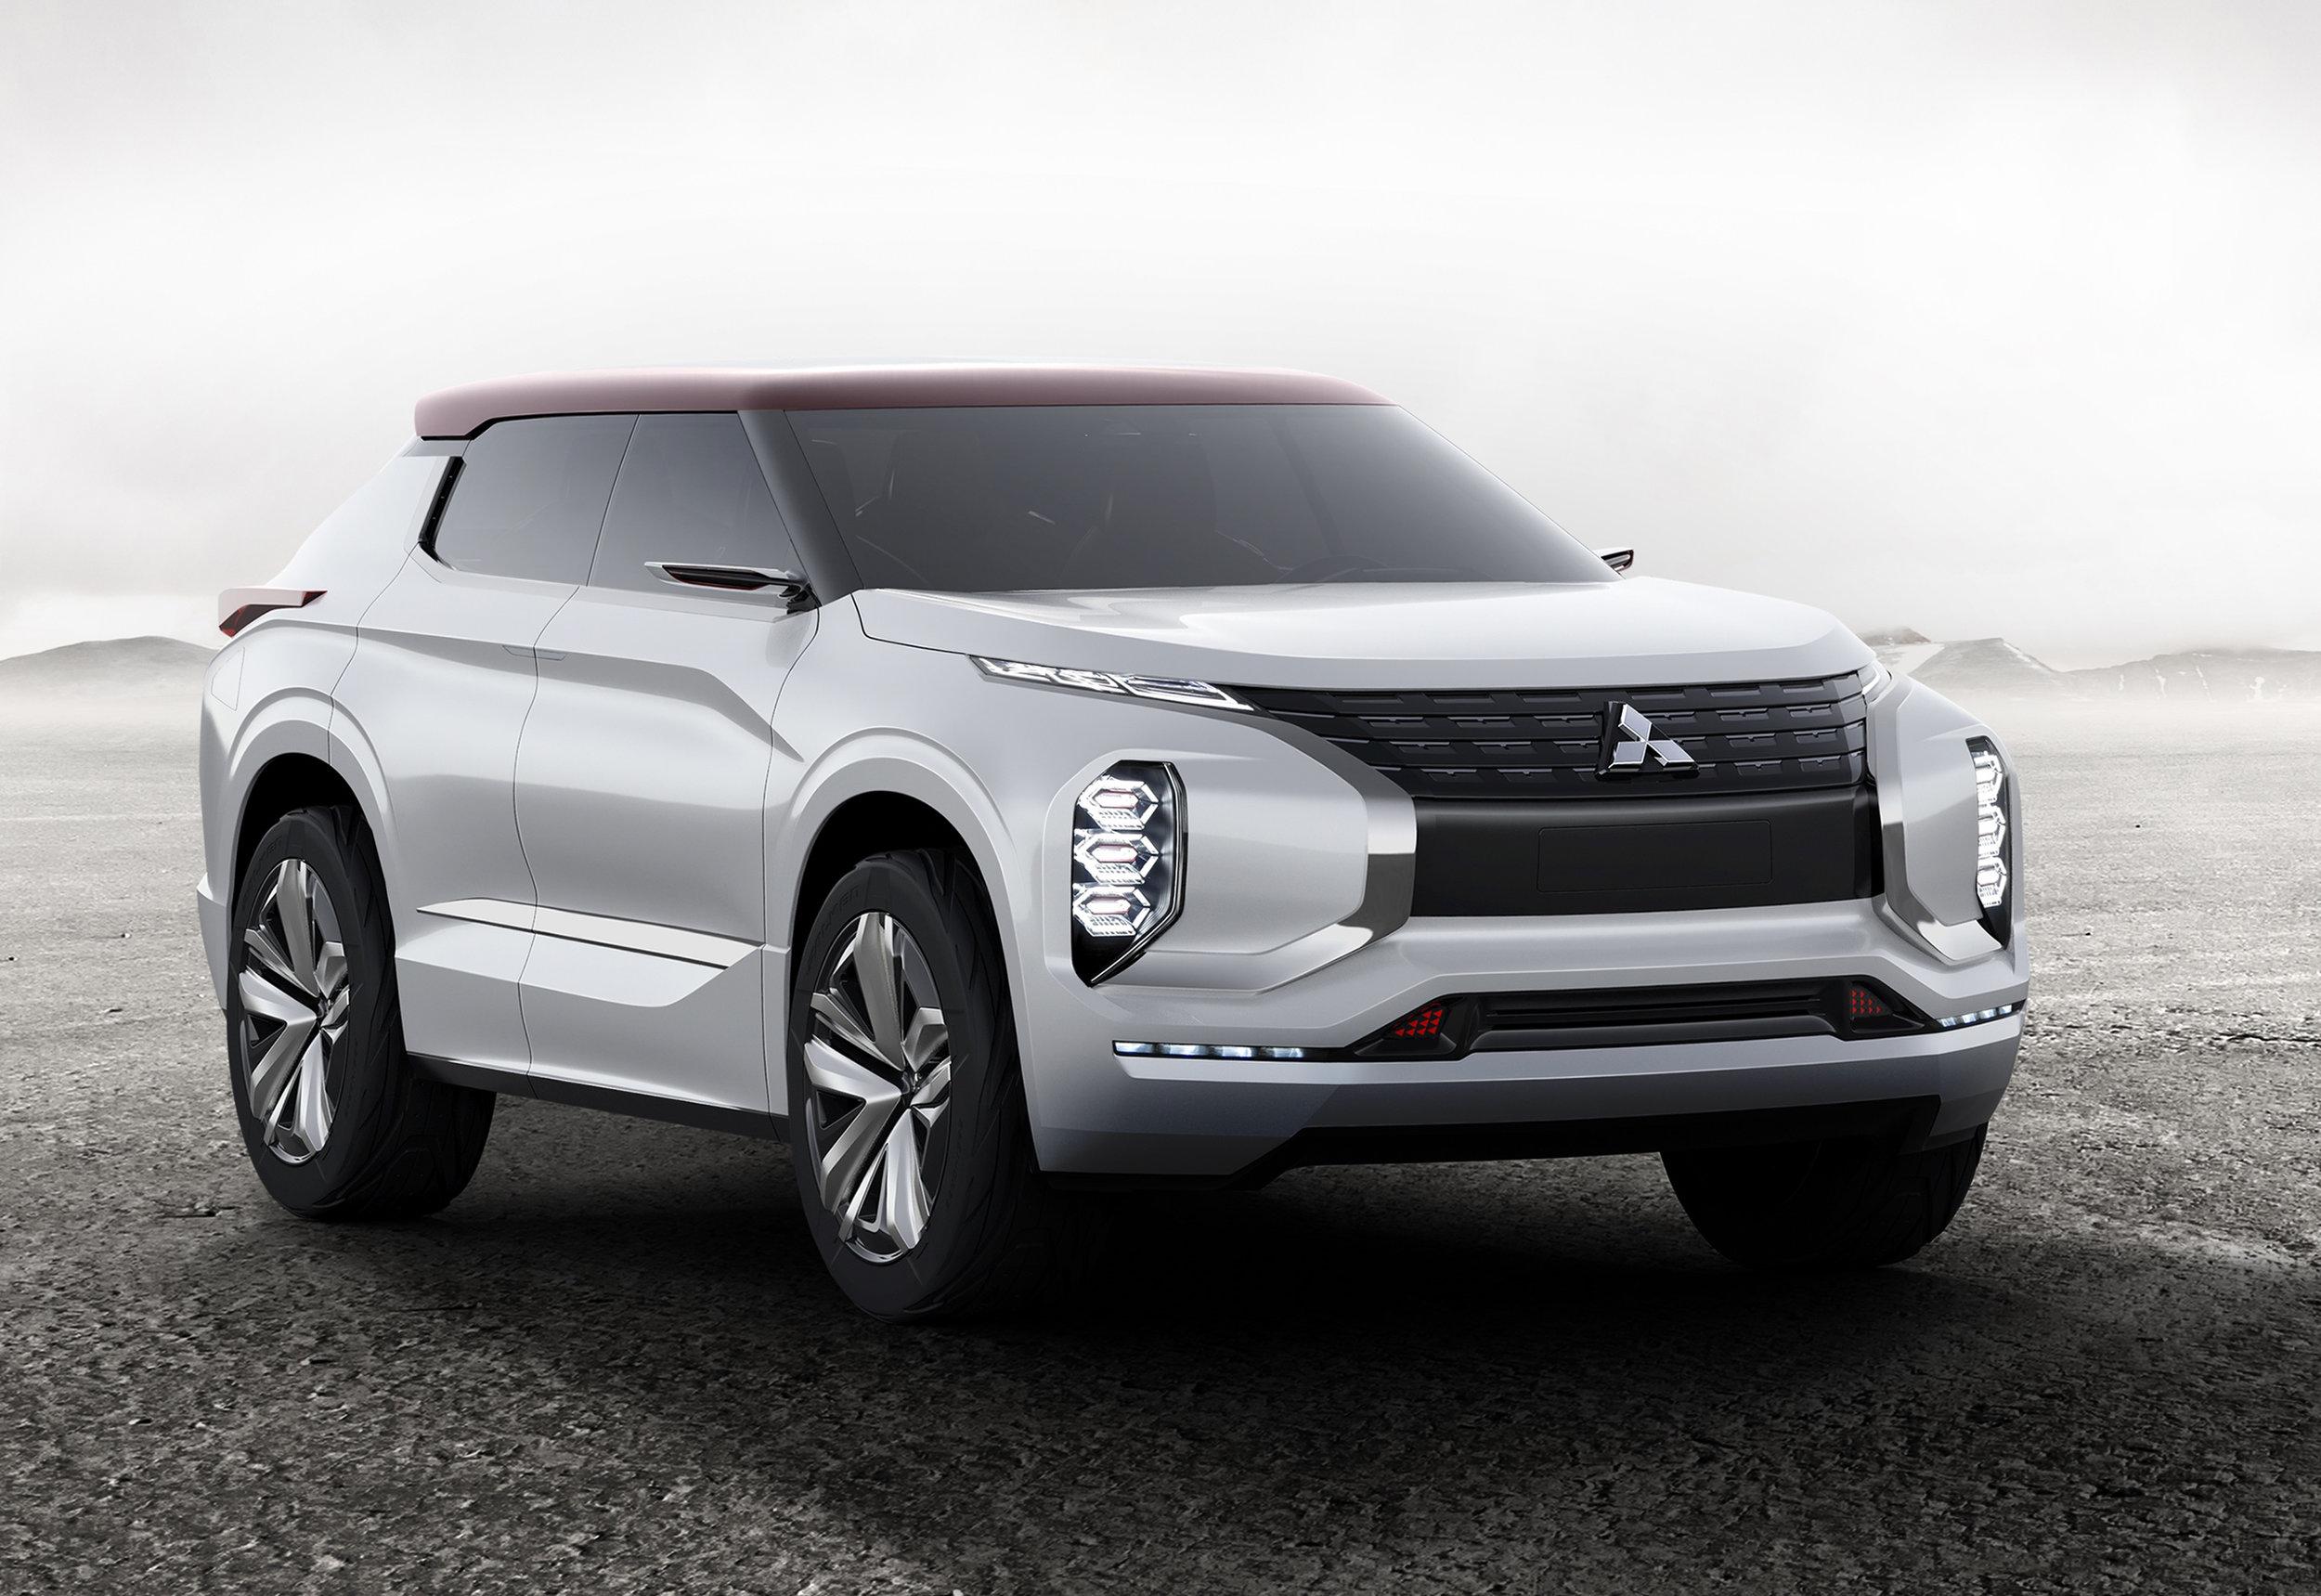 1World-Premiere-of-Ground-Tourer-SUV-Mitsubishi-GT-PHEV-Concept.jpg